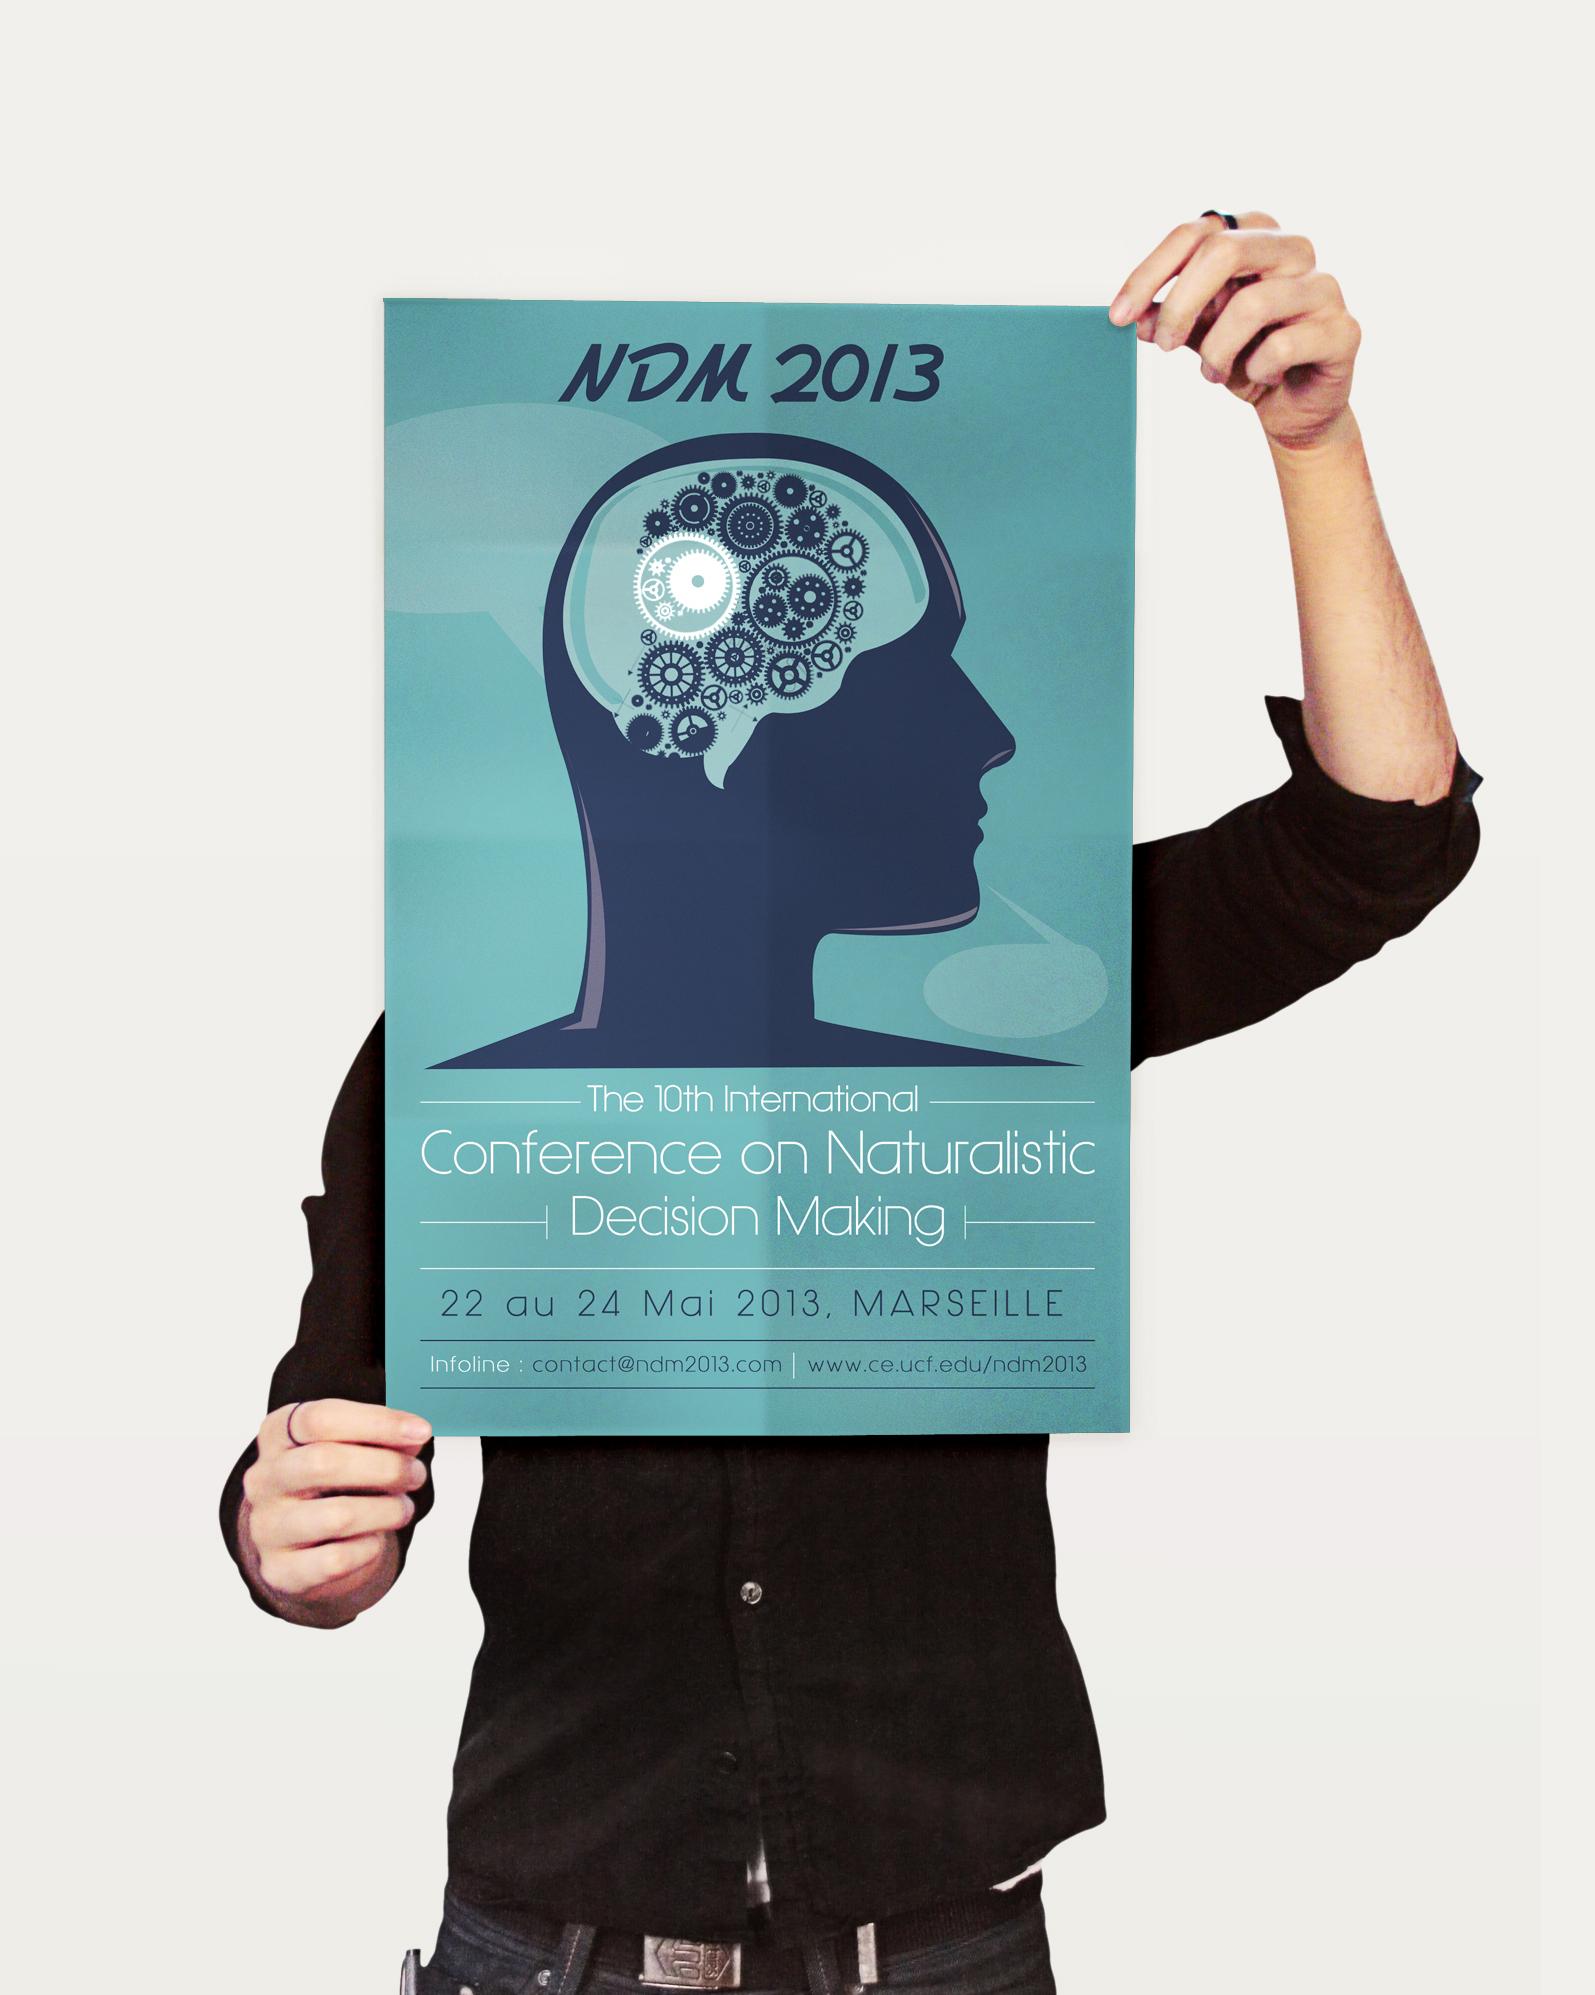 ndm13-1-poster